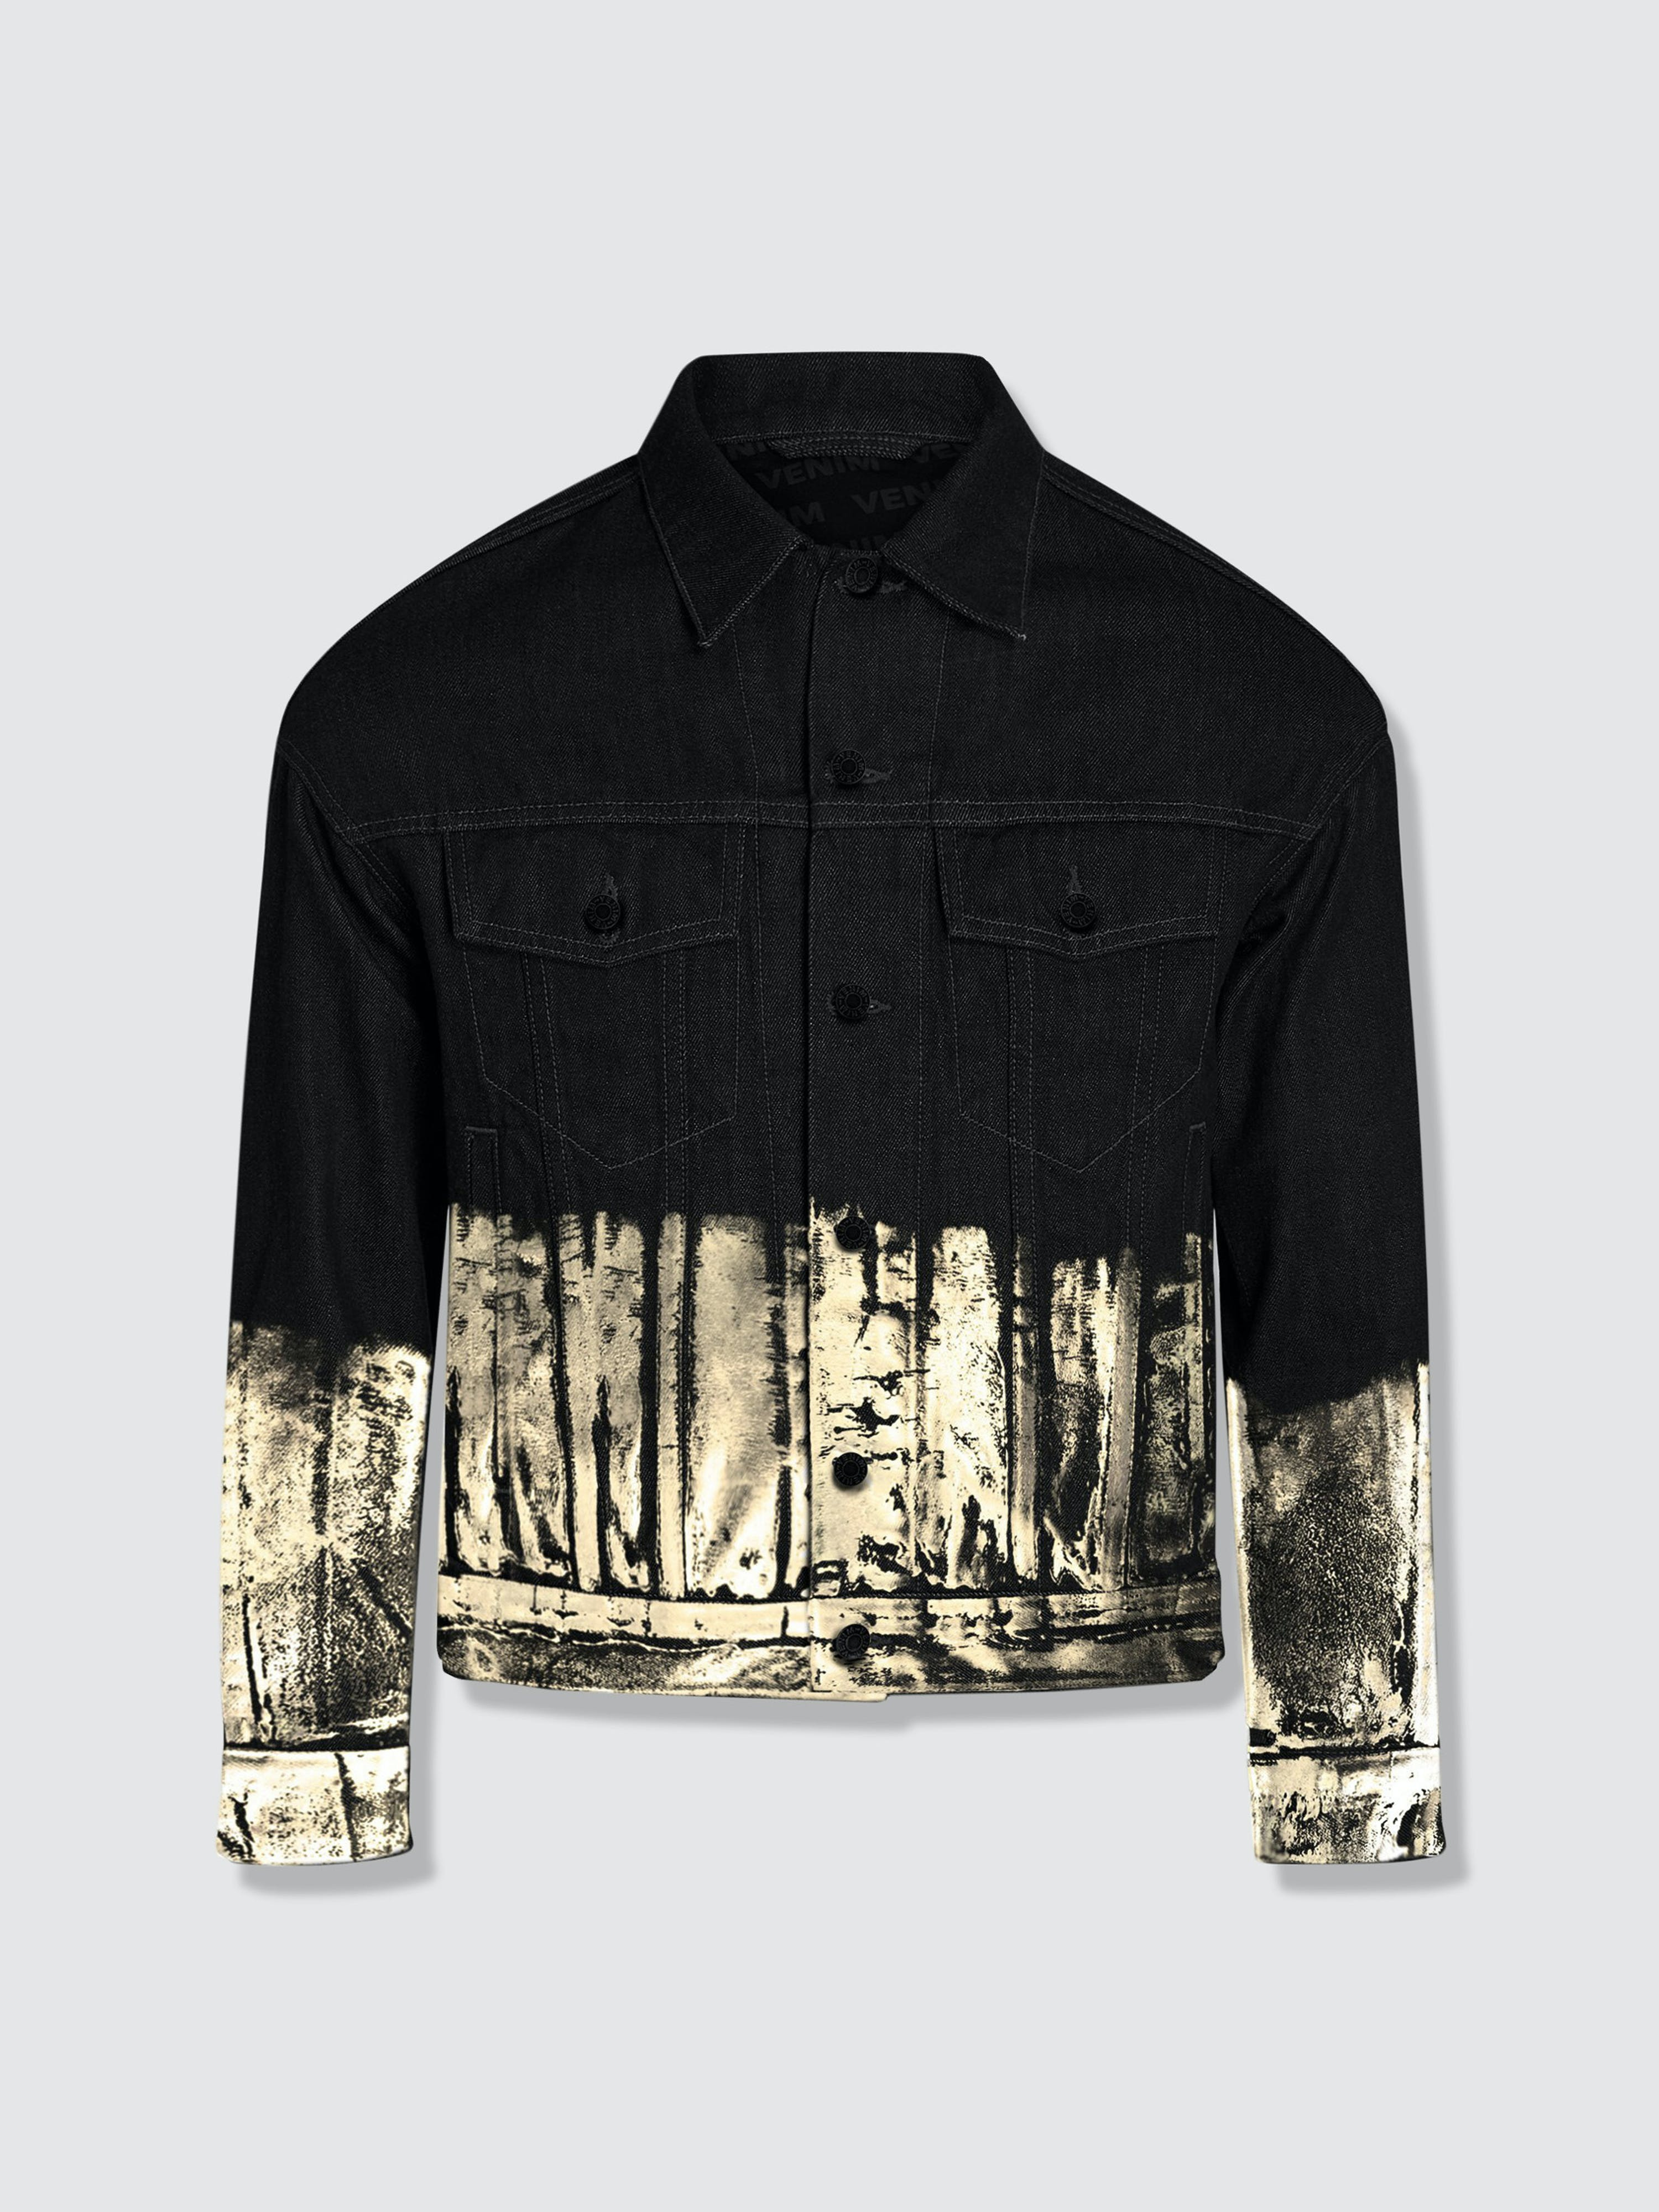 Venim Shorter Classic Black Denim Jacket With Champagne Gold Foil